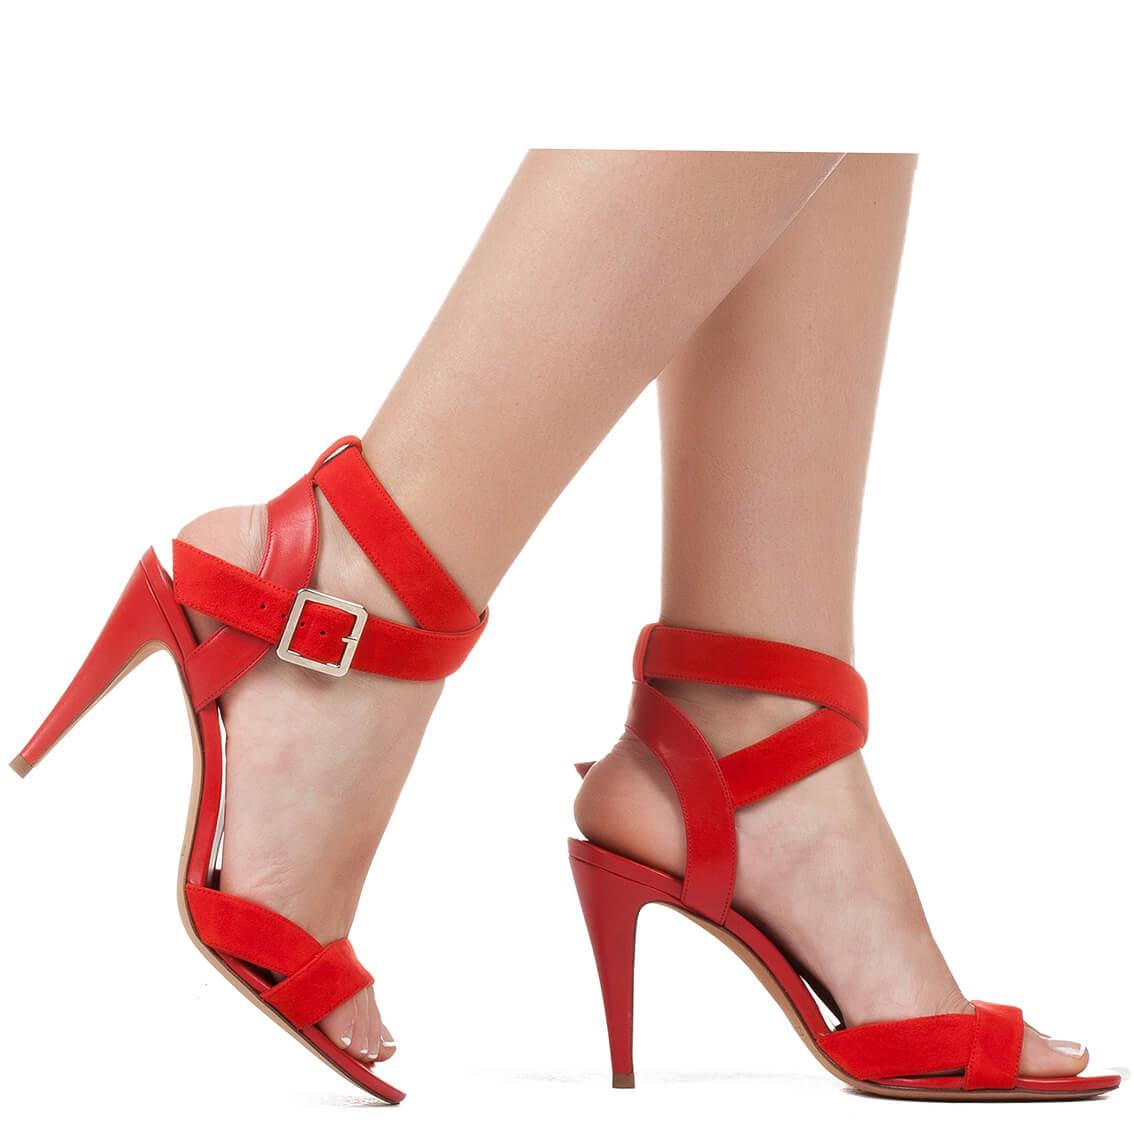 16b0e0ae58a9 Red suede high heel sandals - online shoe store Pura Lopez . PURA LOPEZ